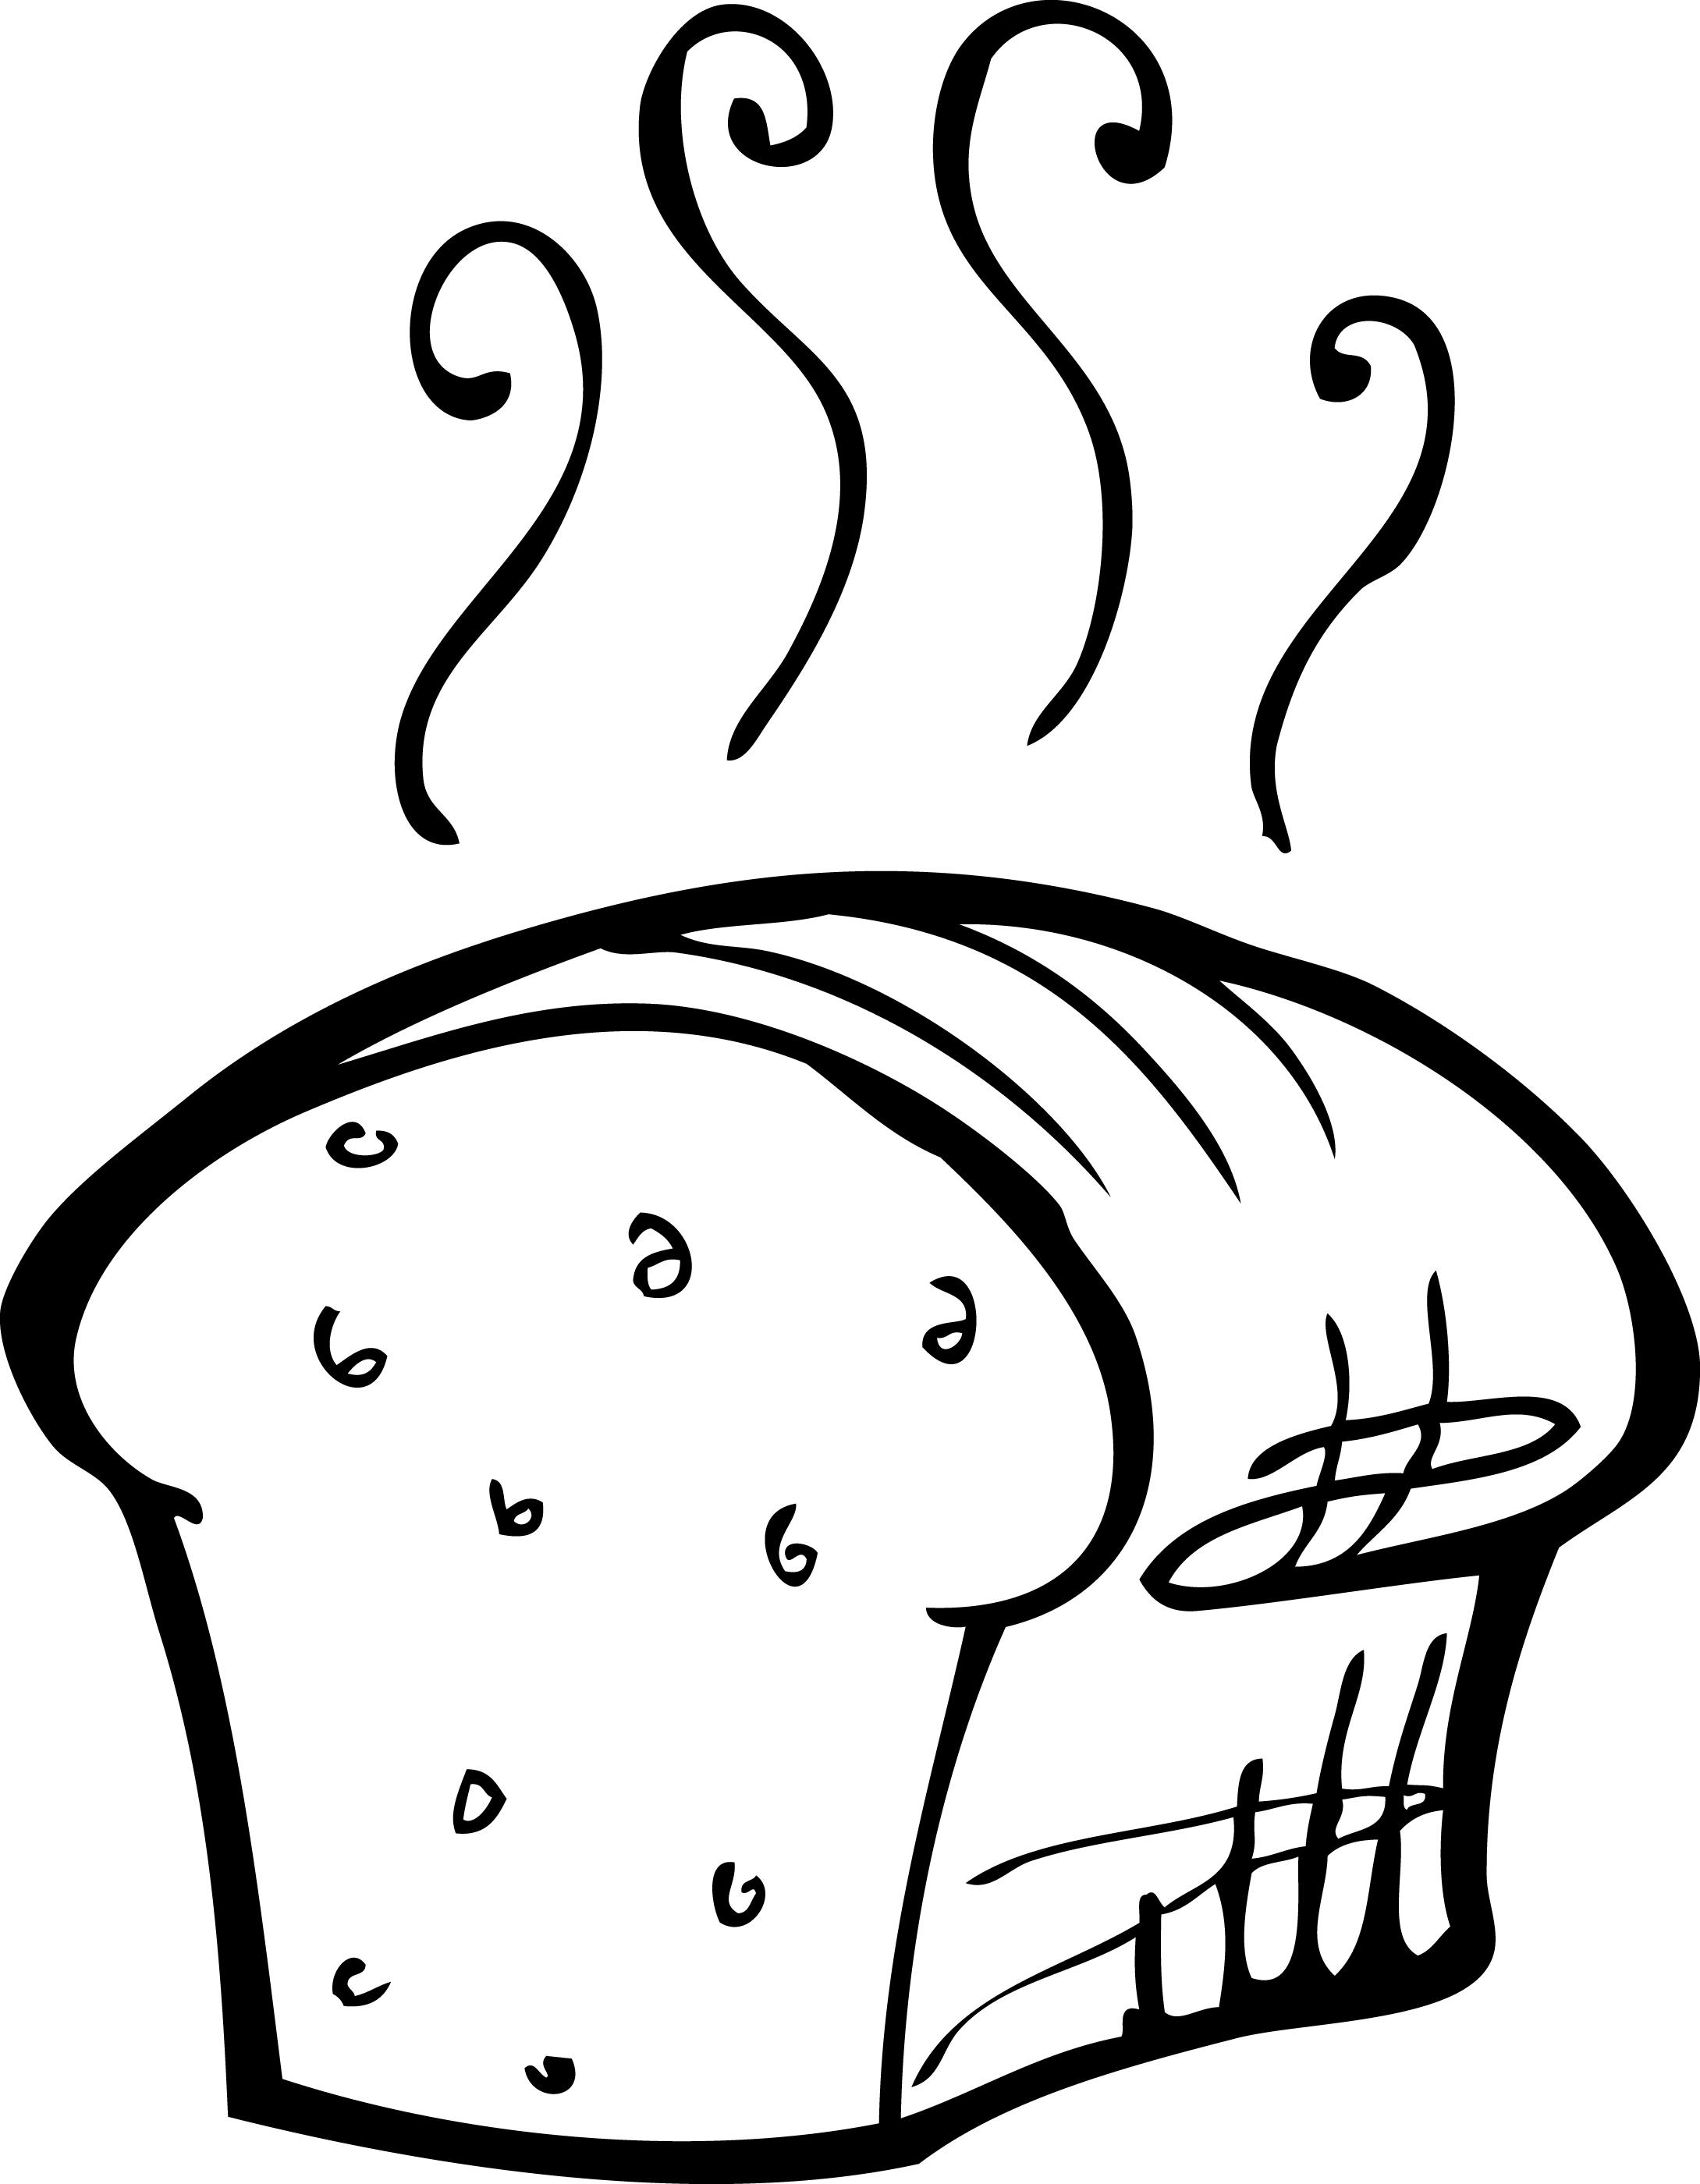 Bread Drawing At Getdrawings